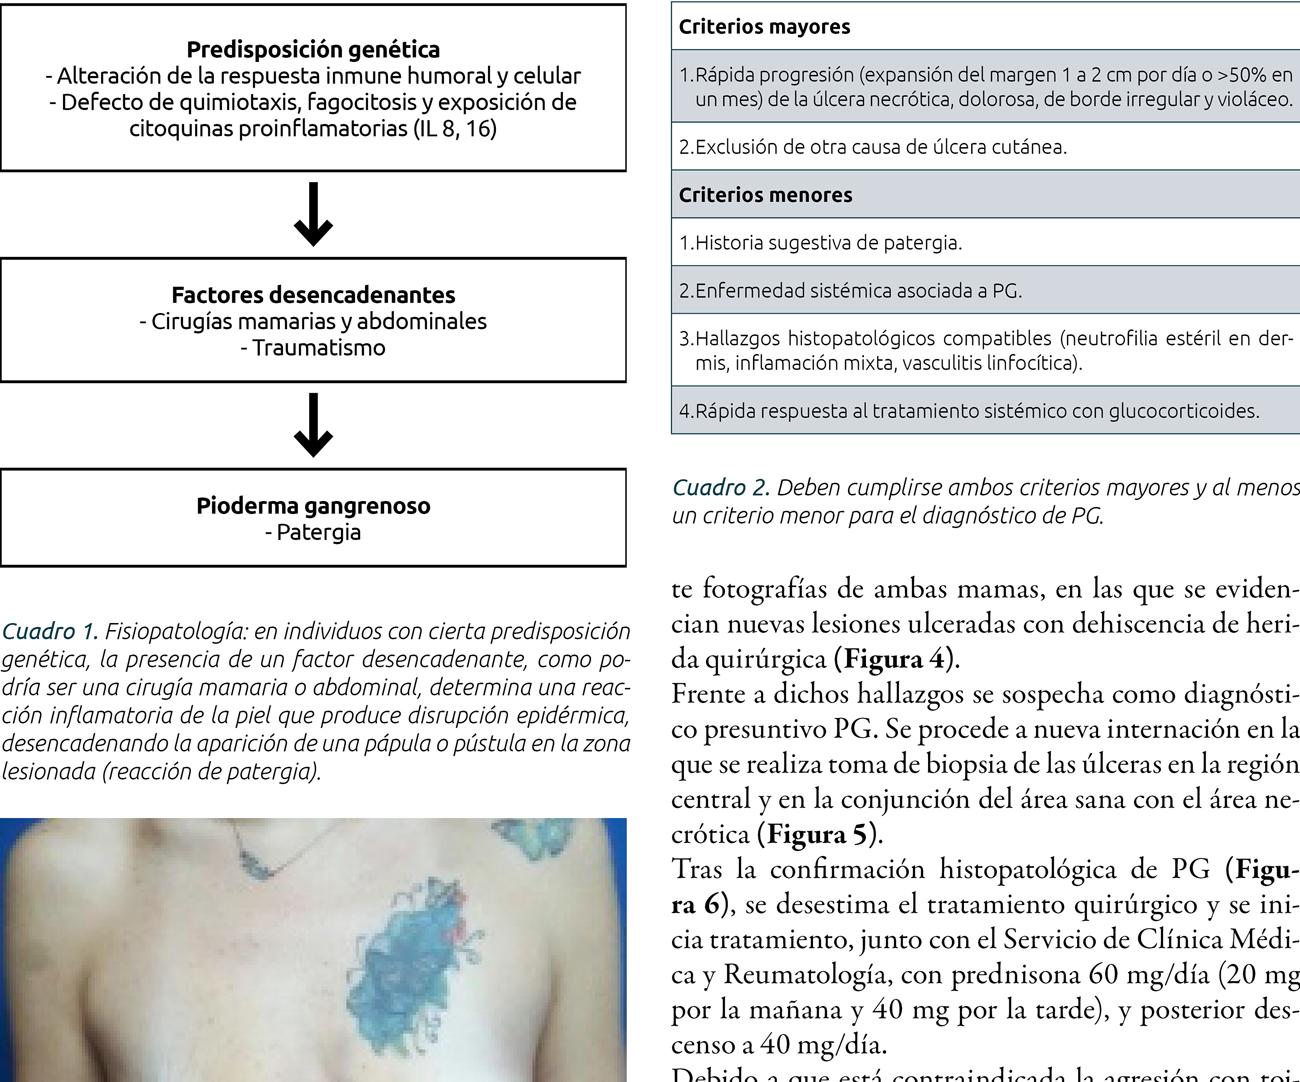 Pioderma gangrenoso en mamoplastia posbariátrica